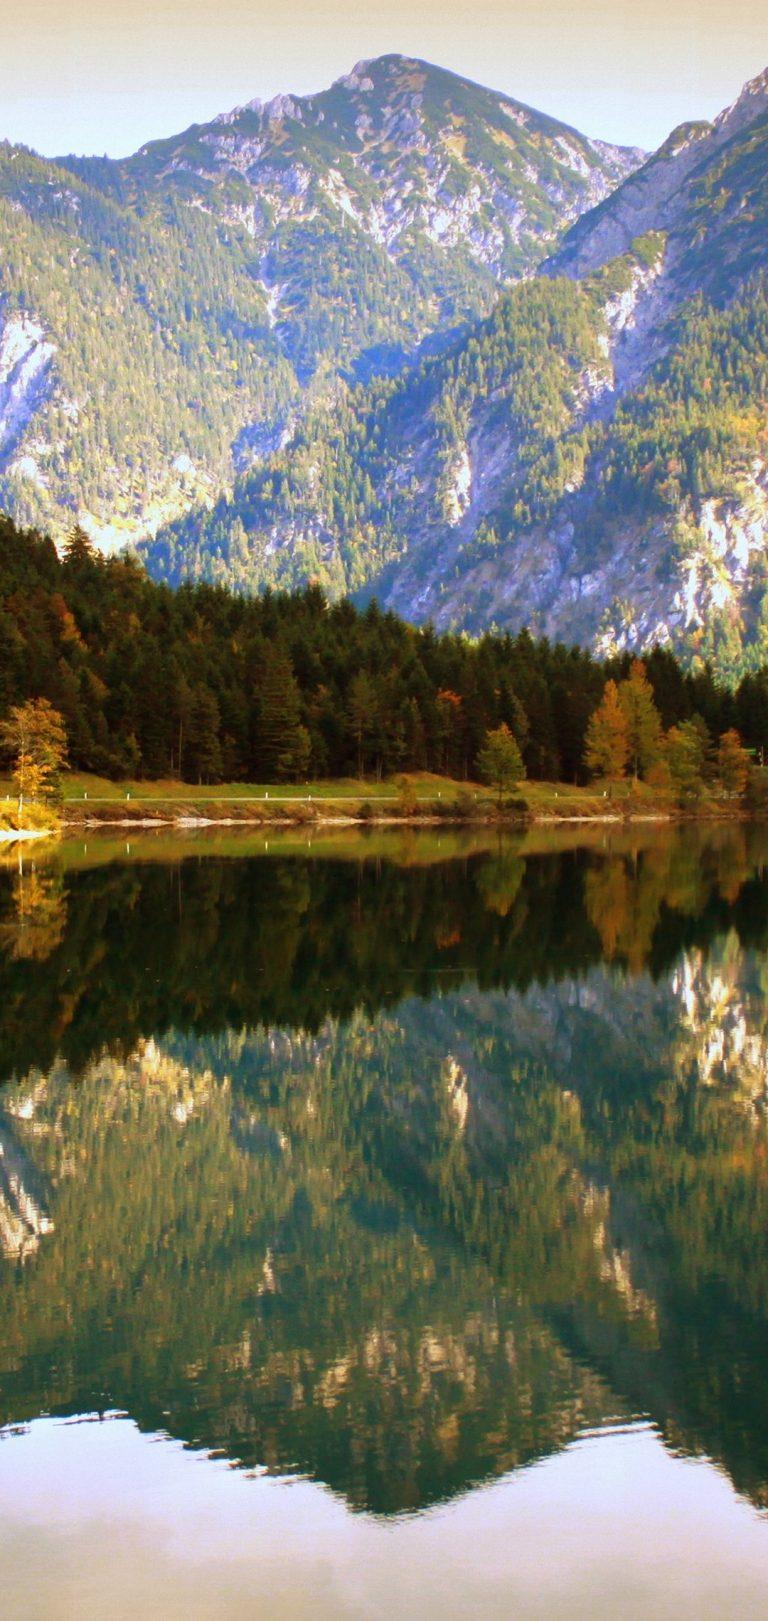 Water Reflection Wallpaper 1080x2280 768x1621